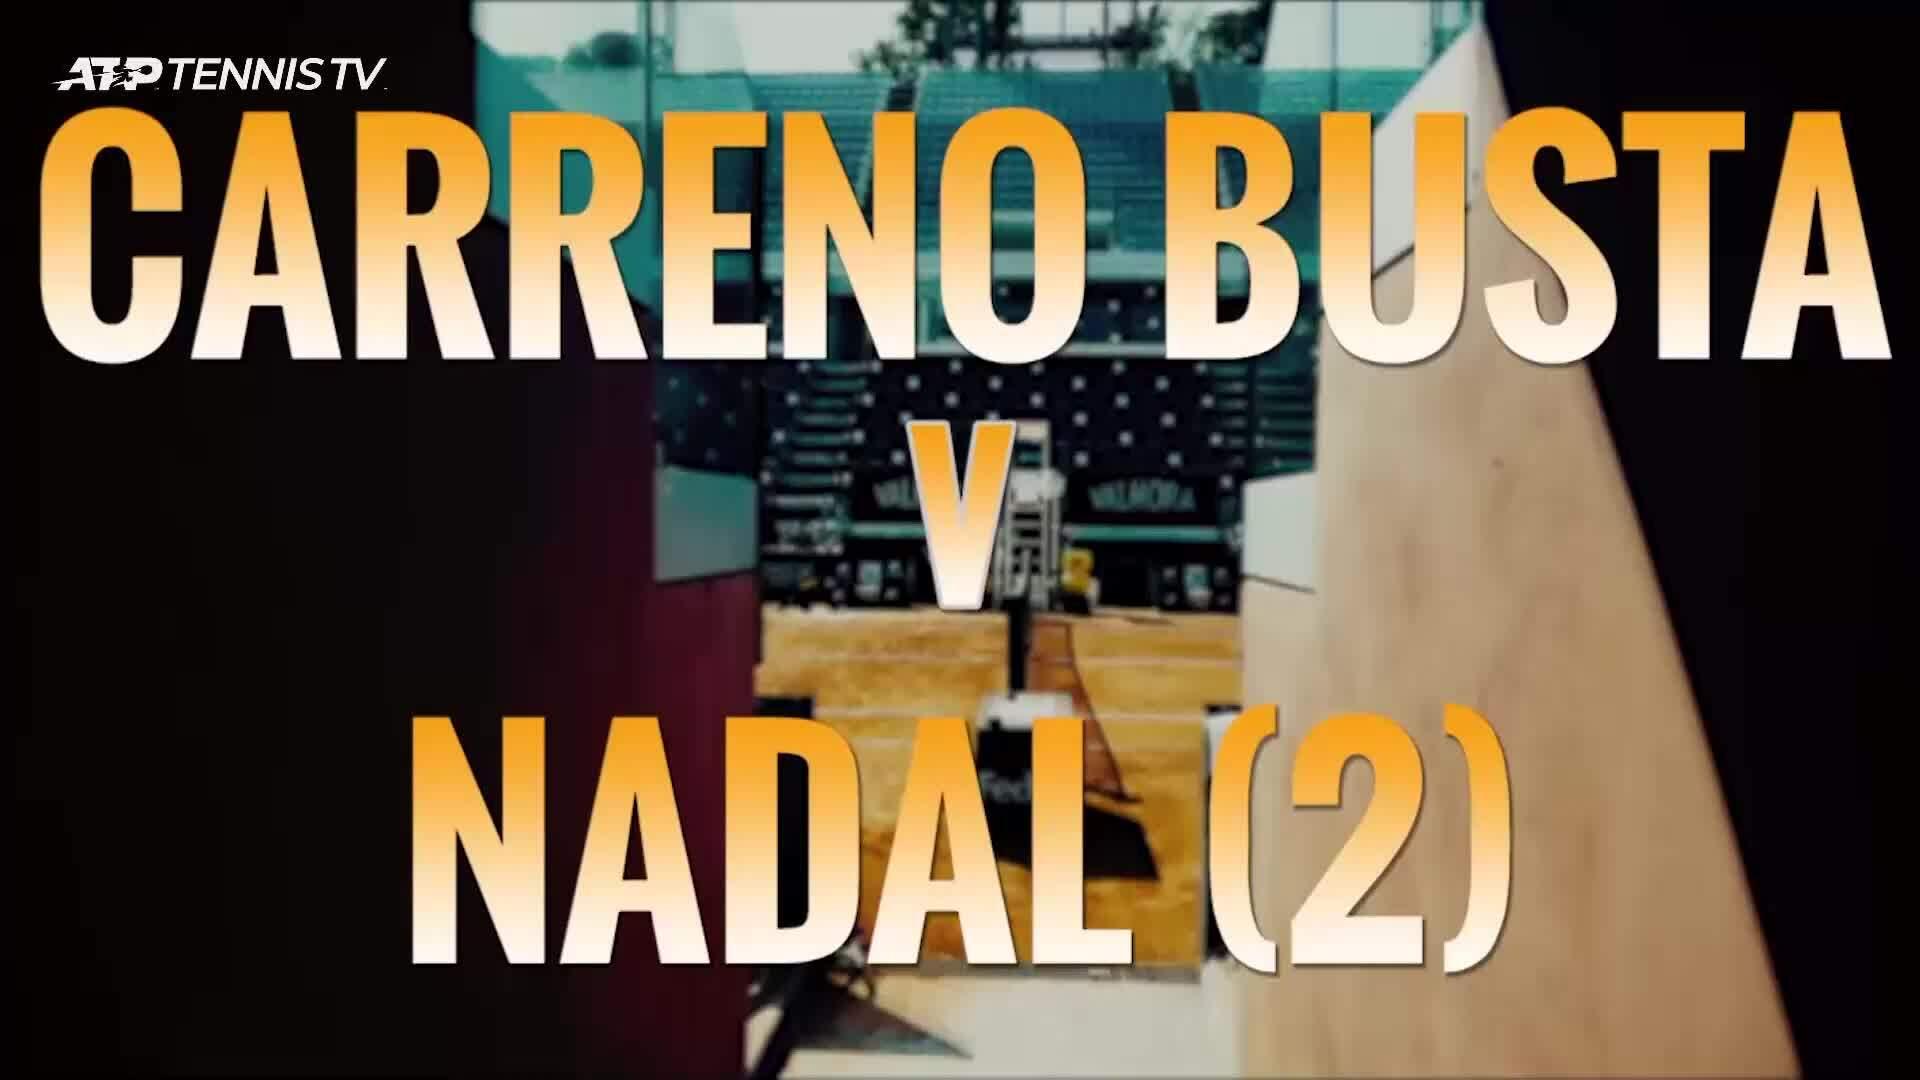 Nadal 2-0 Carreno-Busta